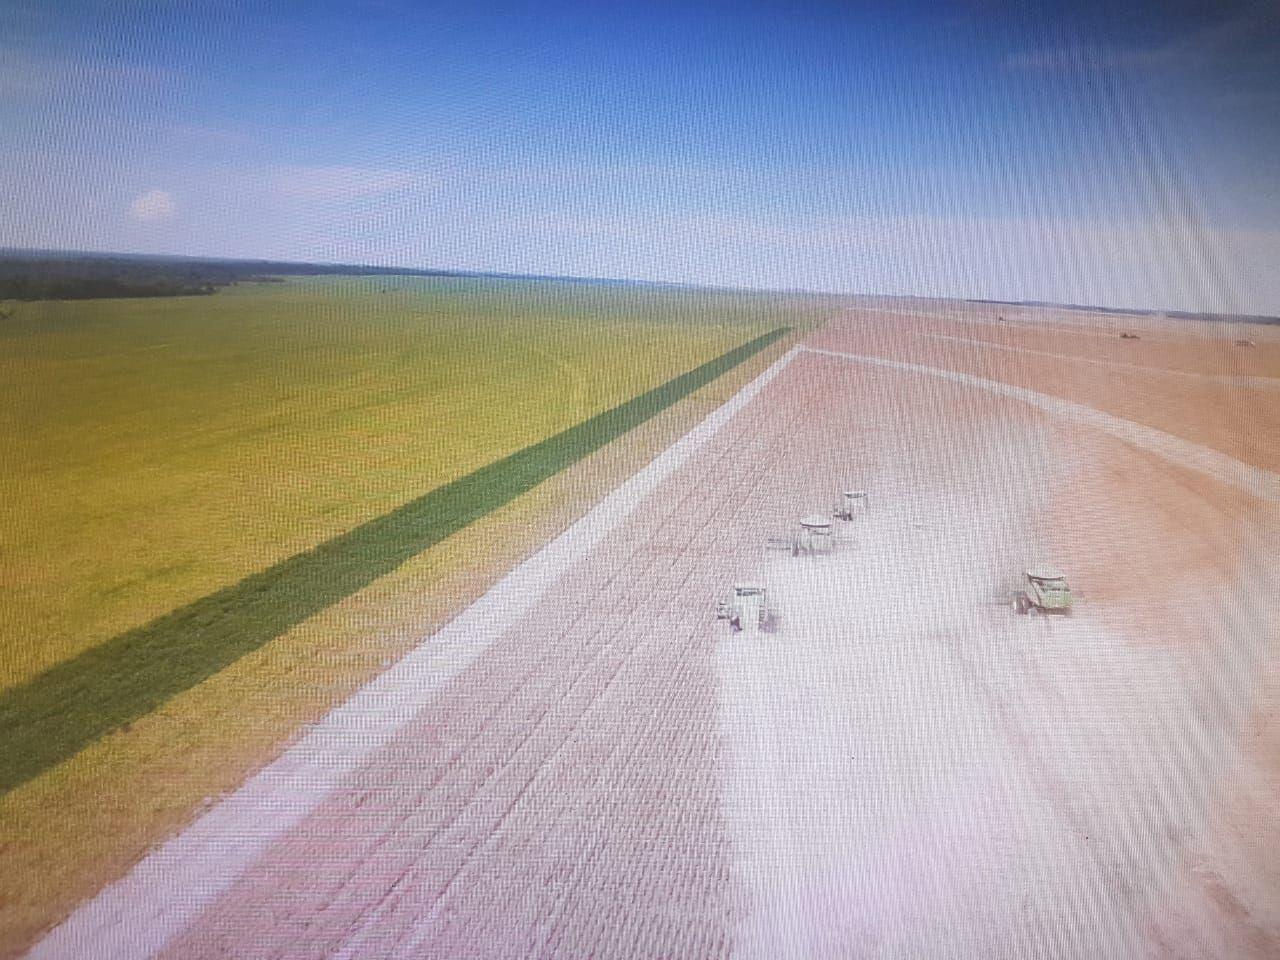 Terreno comercial à venda  no Zona Rural - Primavera do Leste, MT. Imóveis